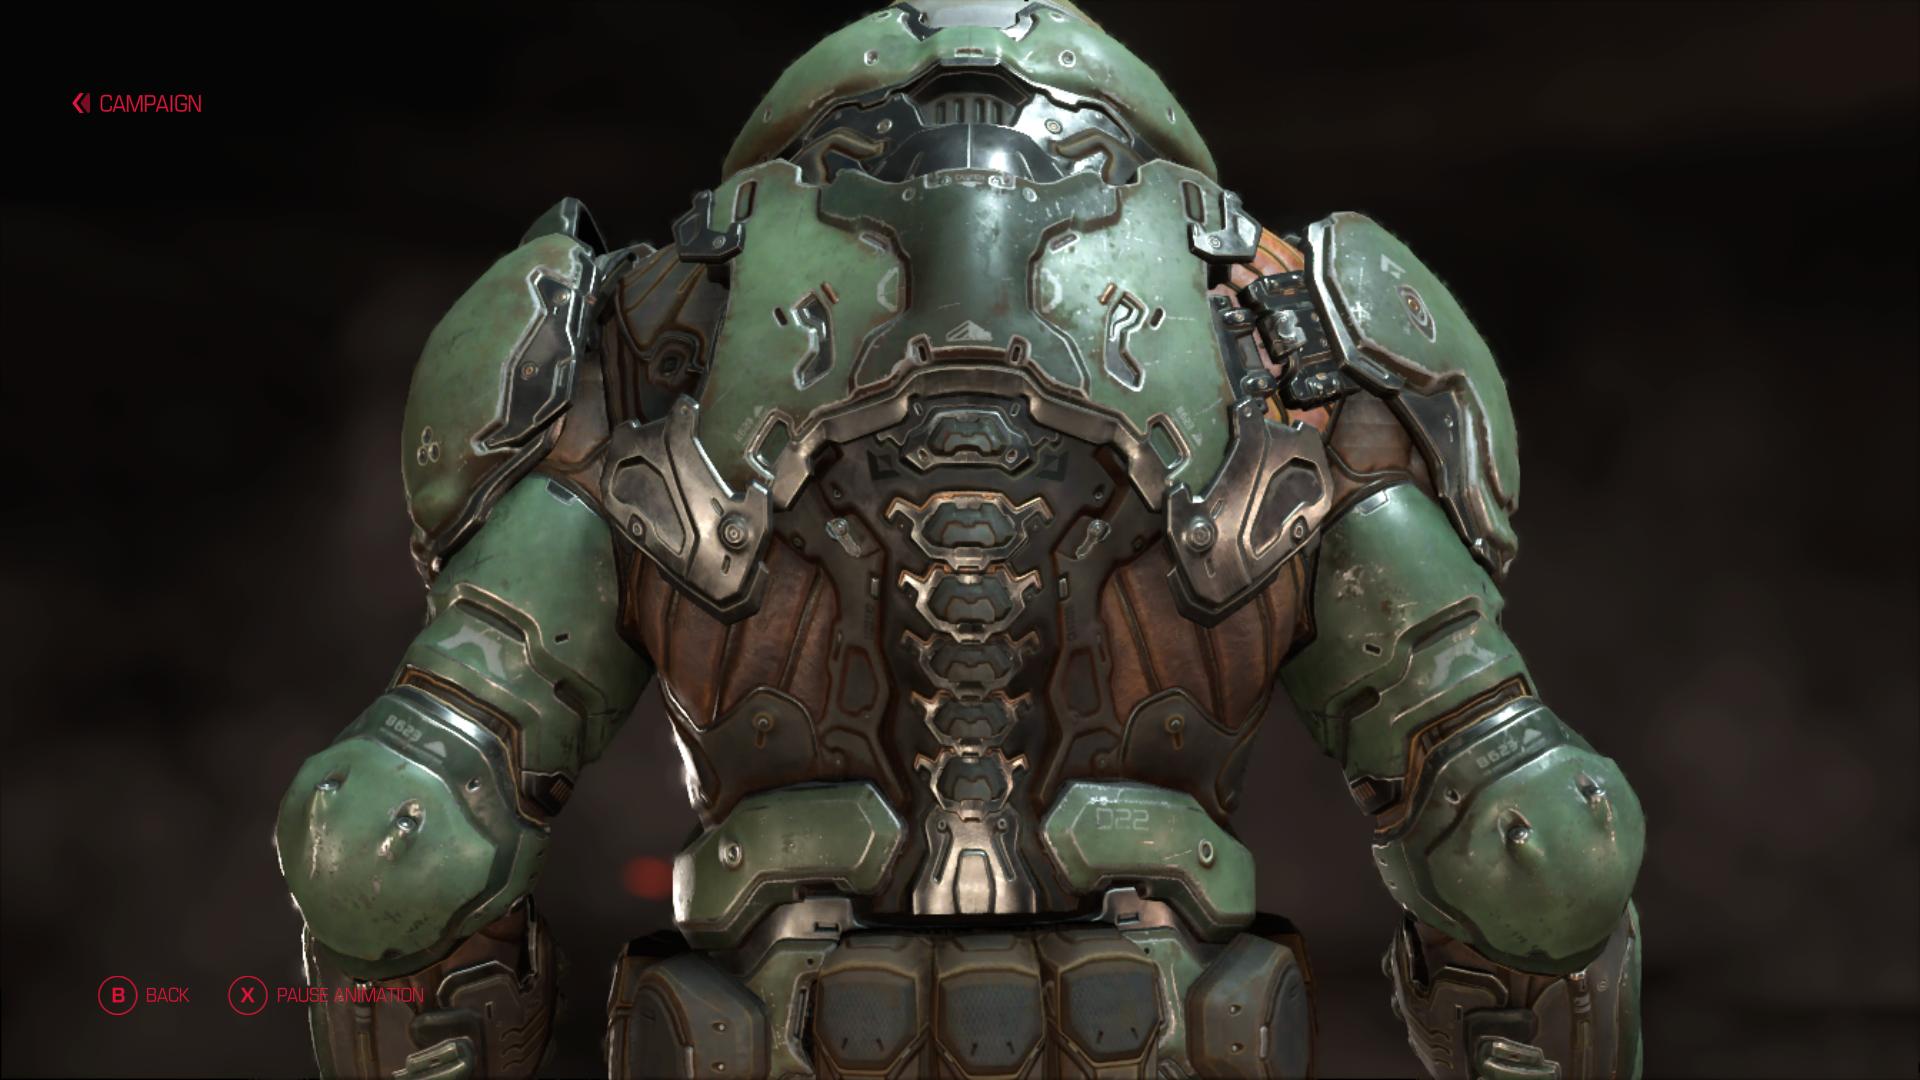 Doom Marine Build 2016 Halo Costume And Prop Maker